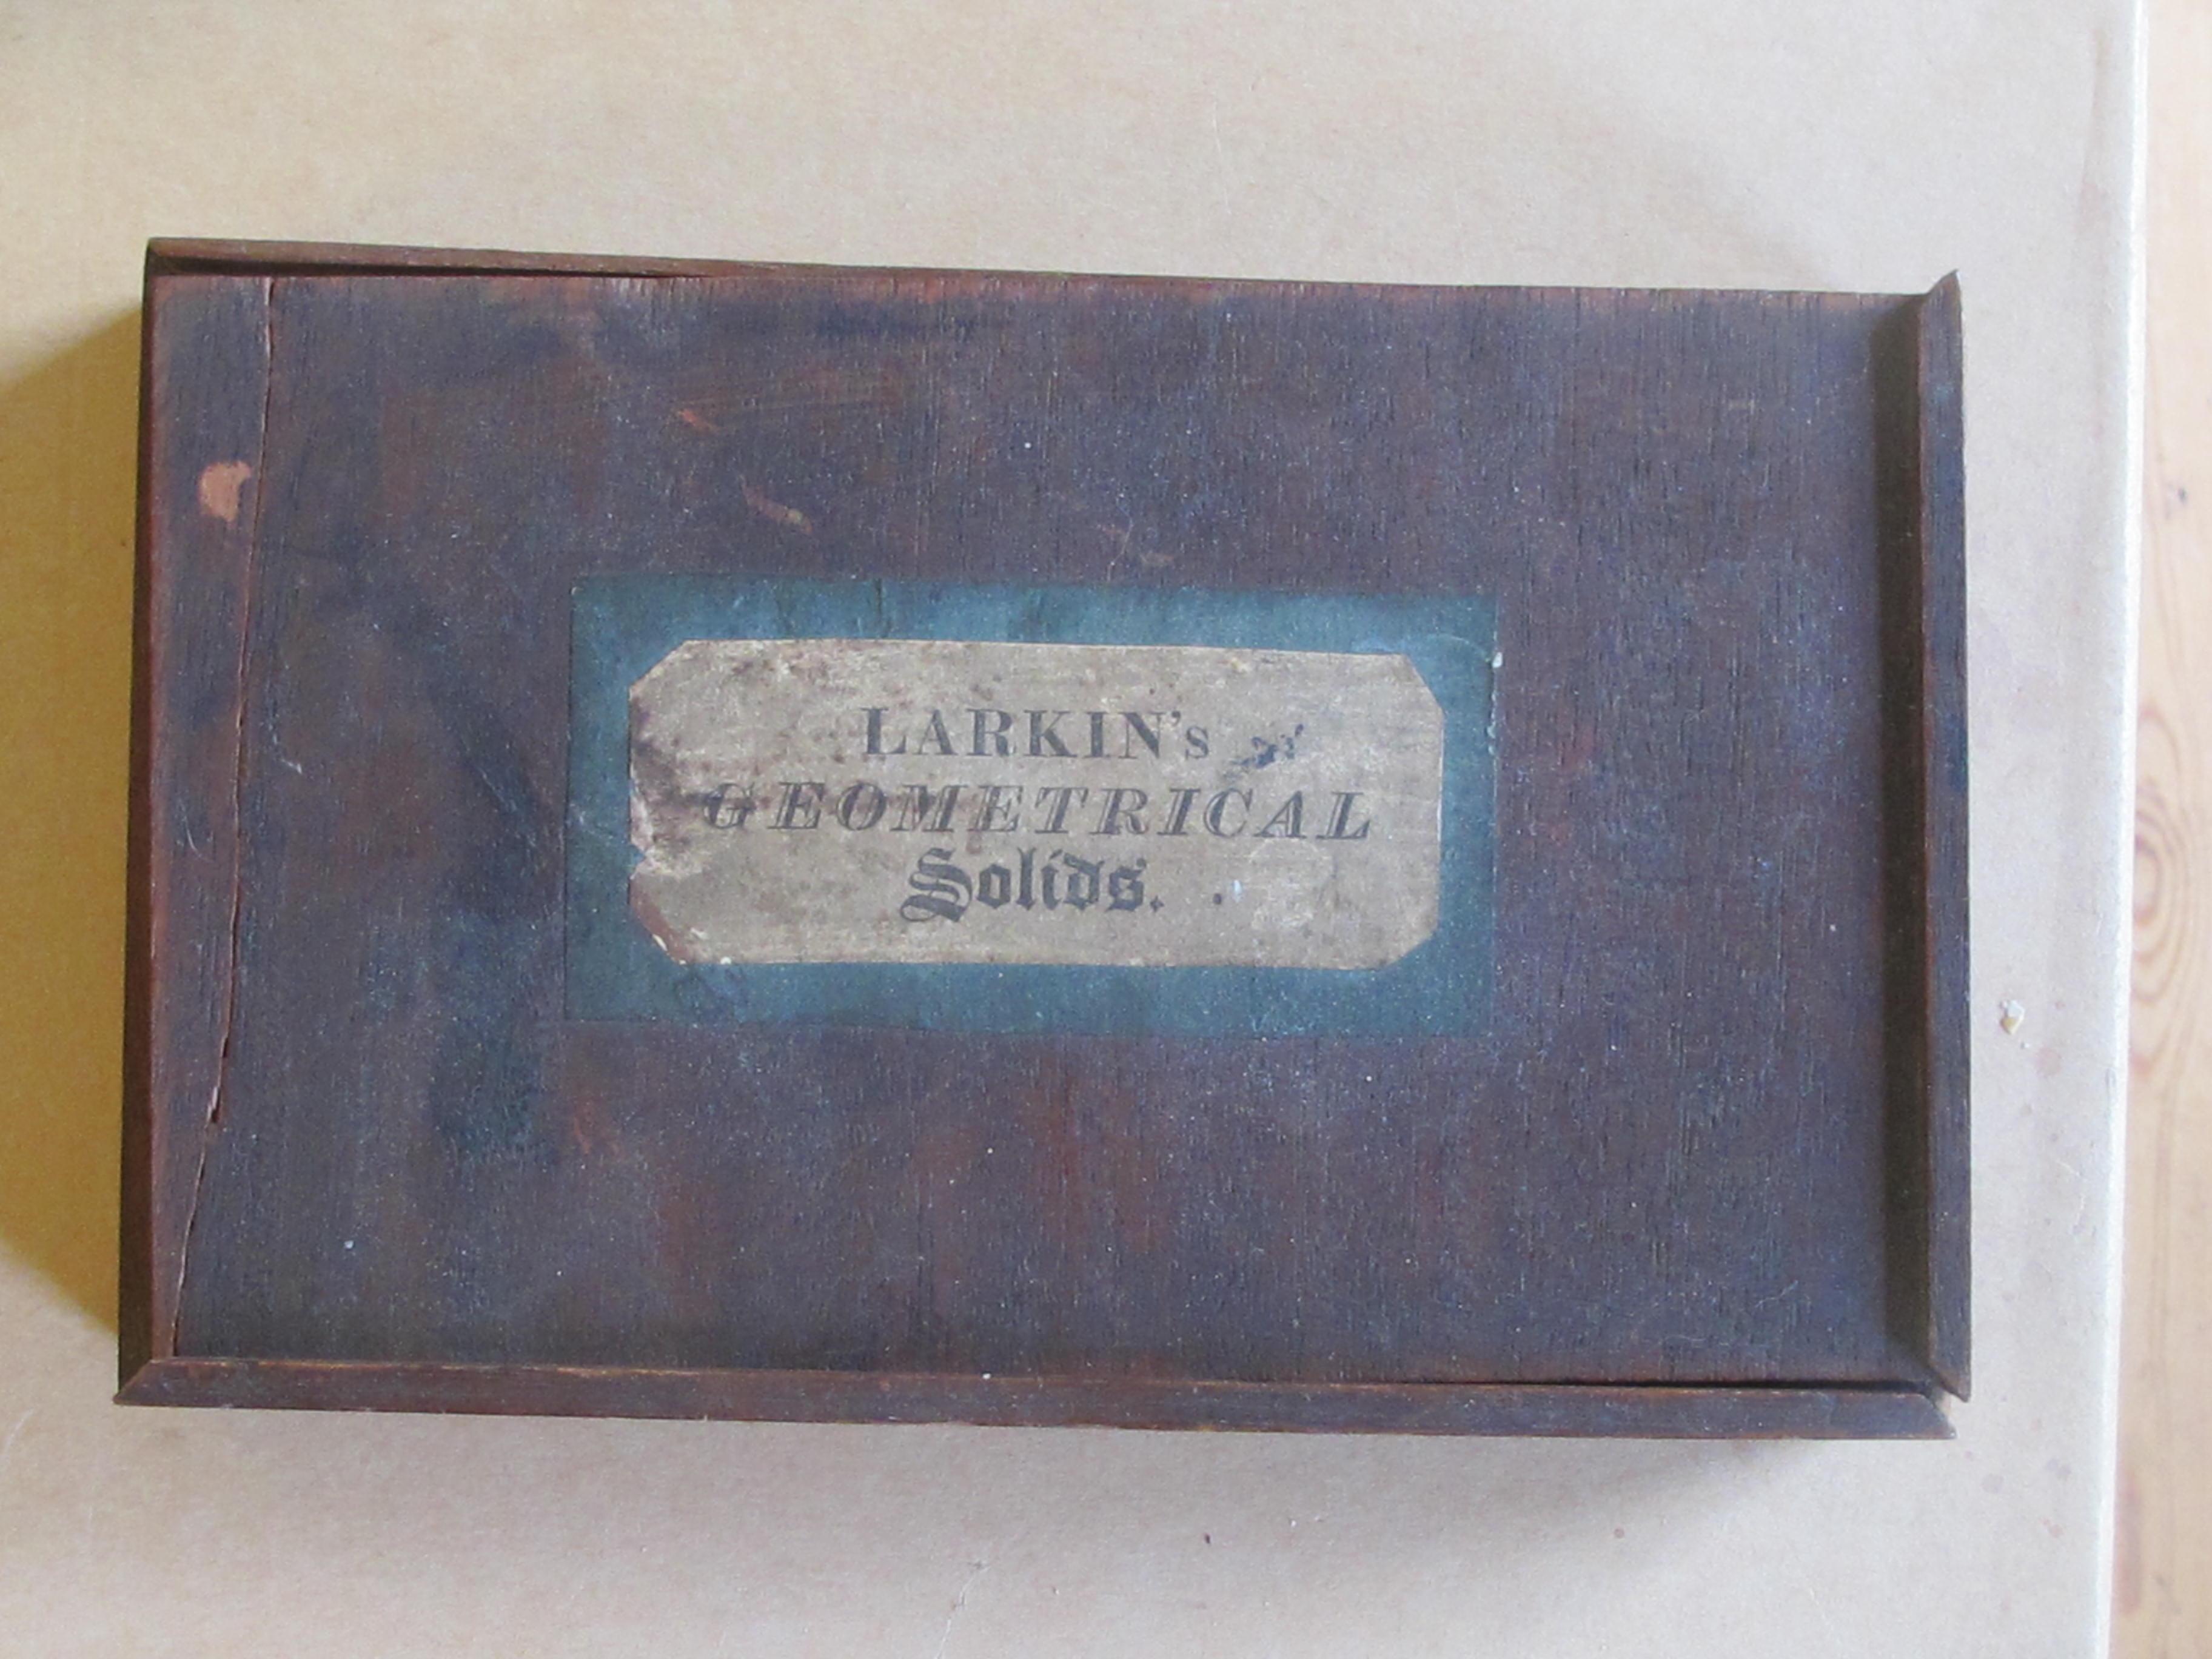 A Set of Larkin's Geometrical Solids c1820